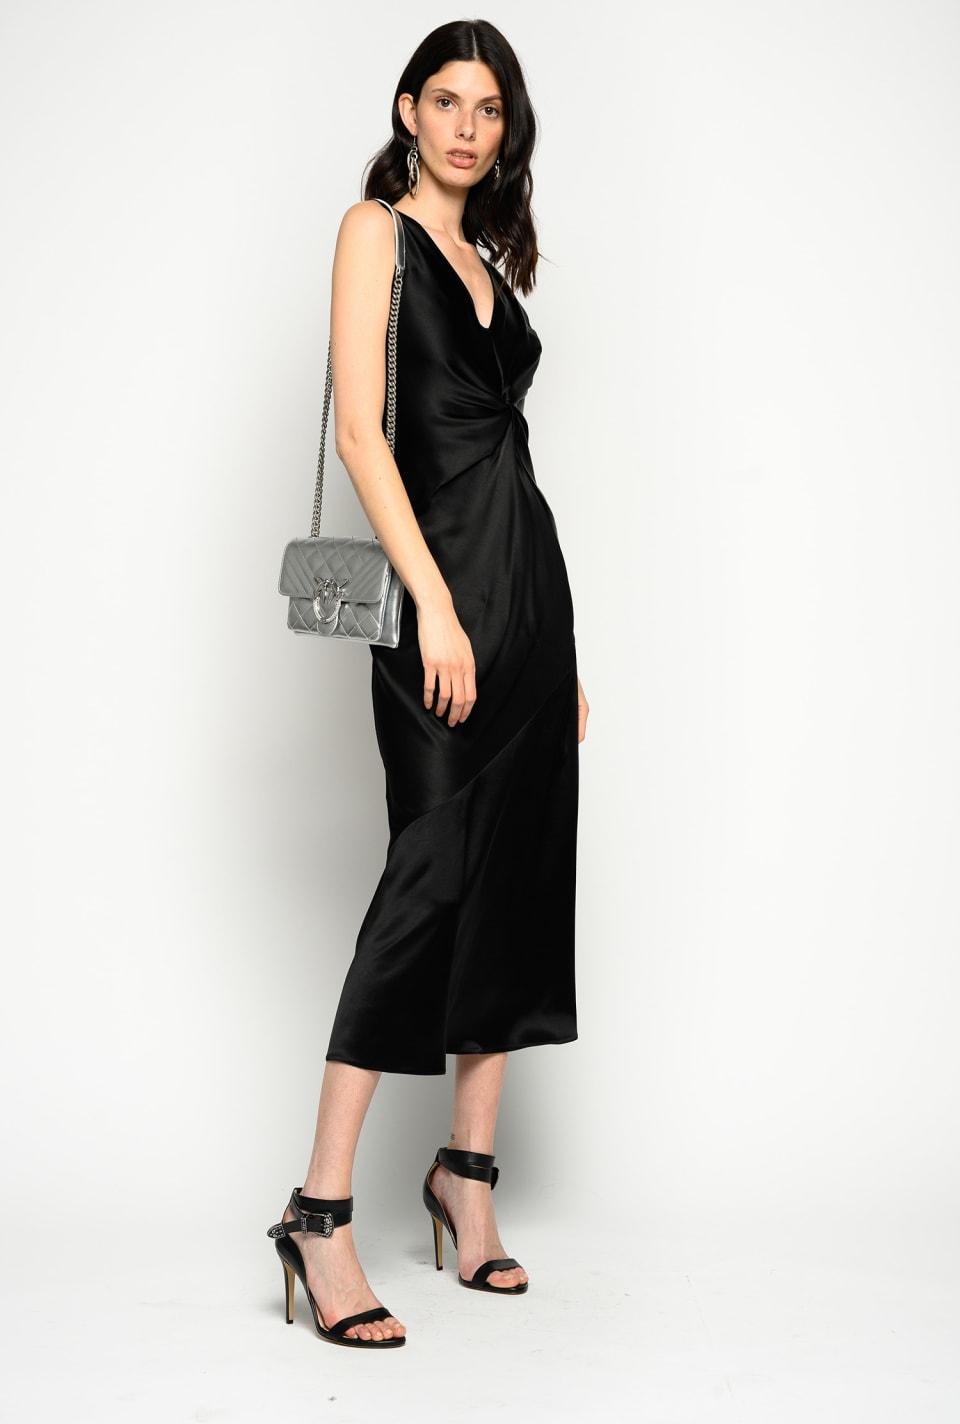 Two-tone satin dress